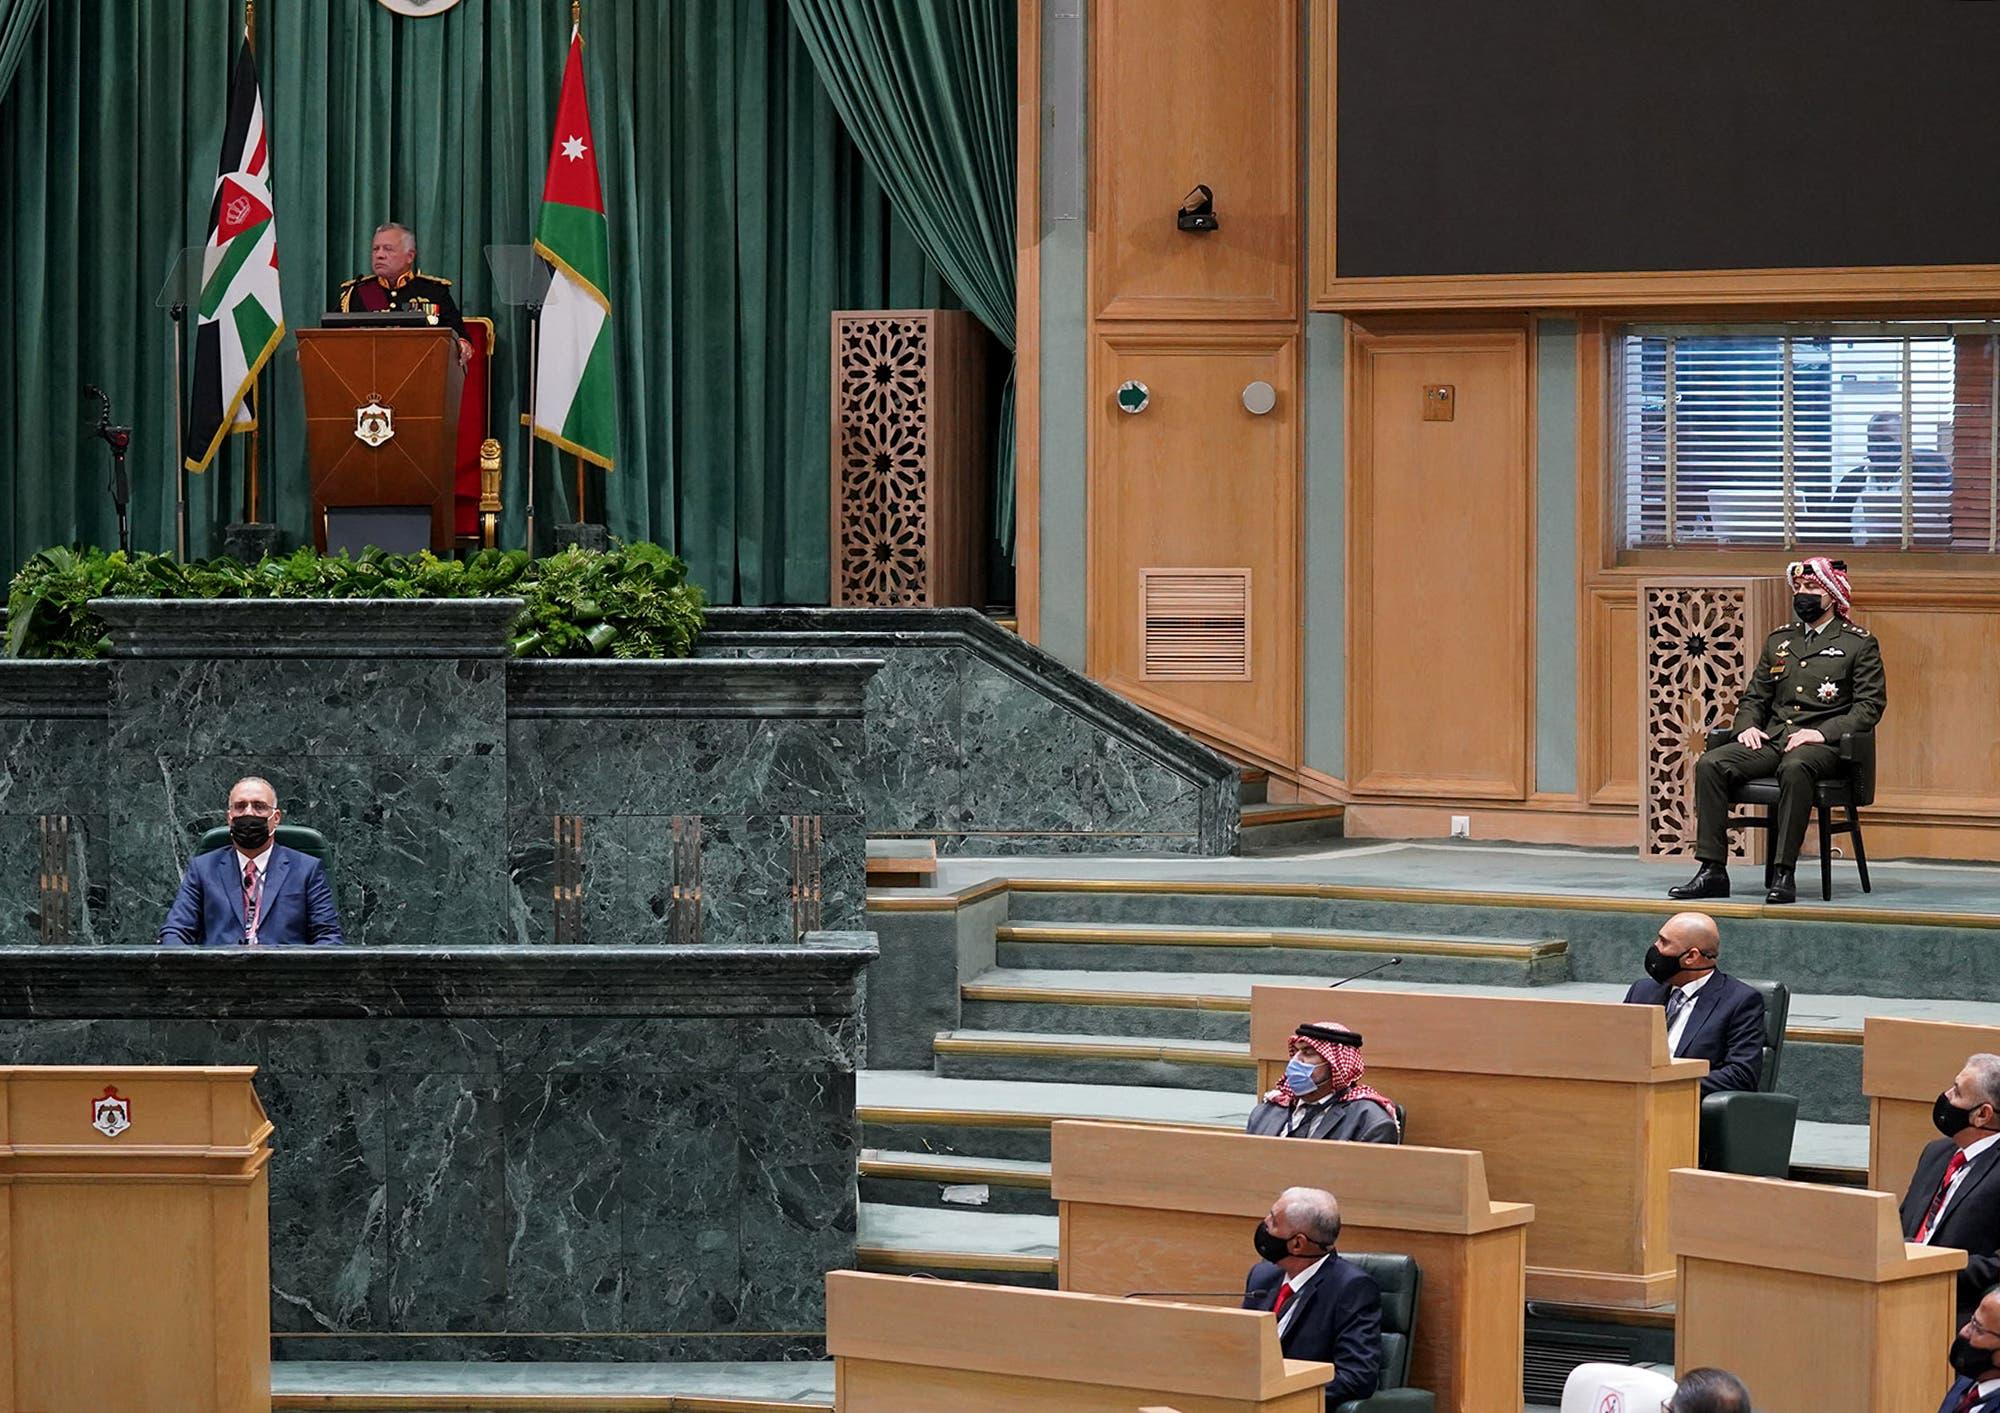 King Abdullah II calls for dialogue in the interests of Jordan